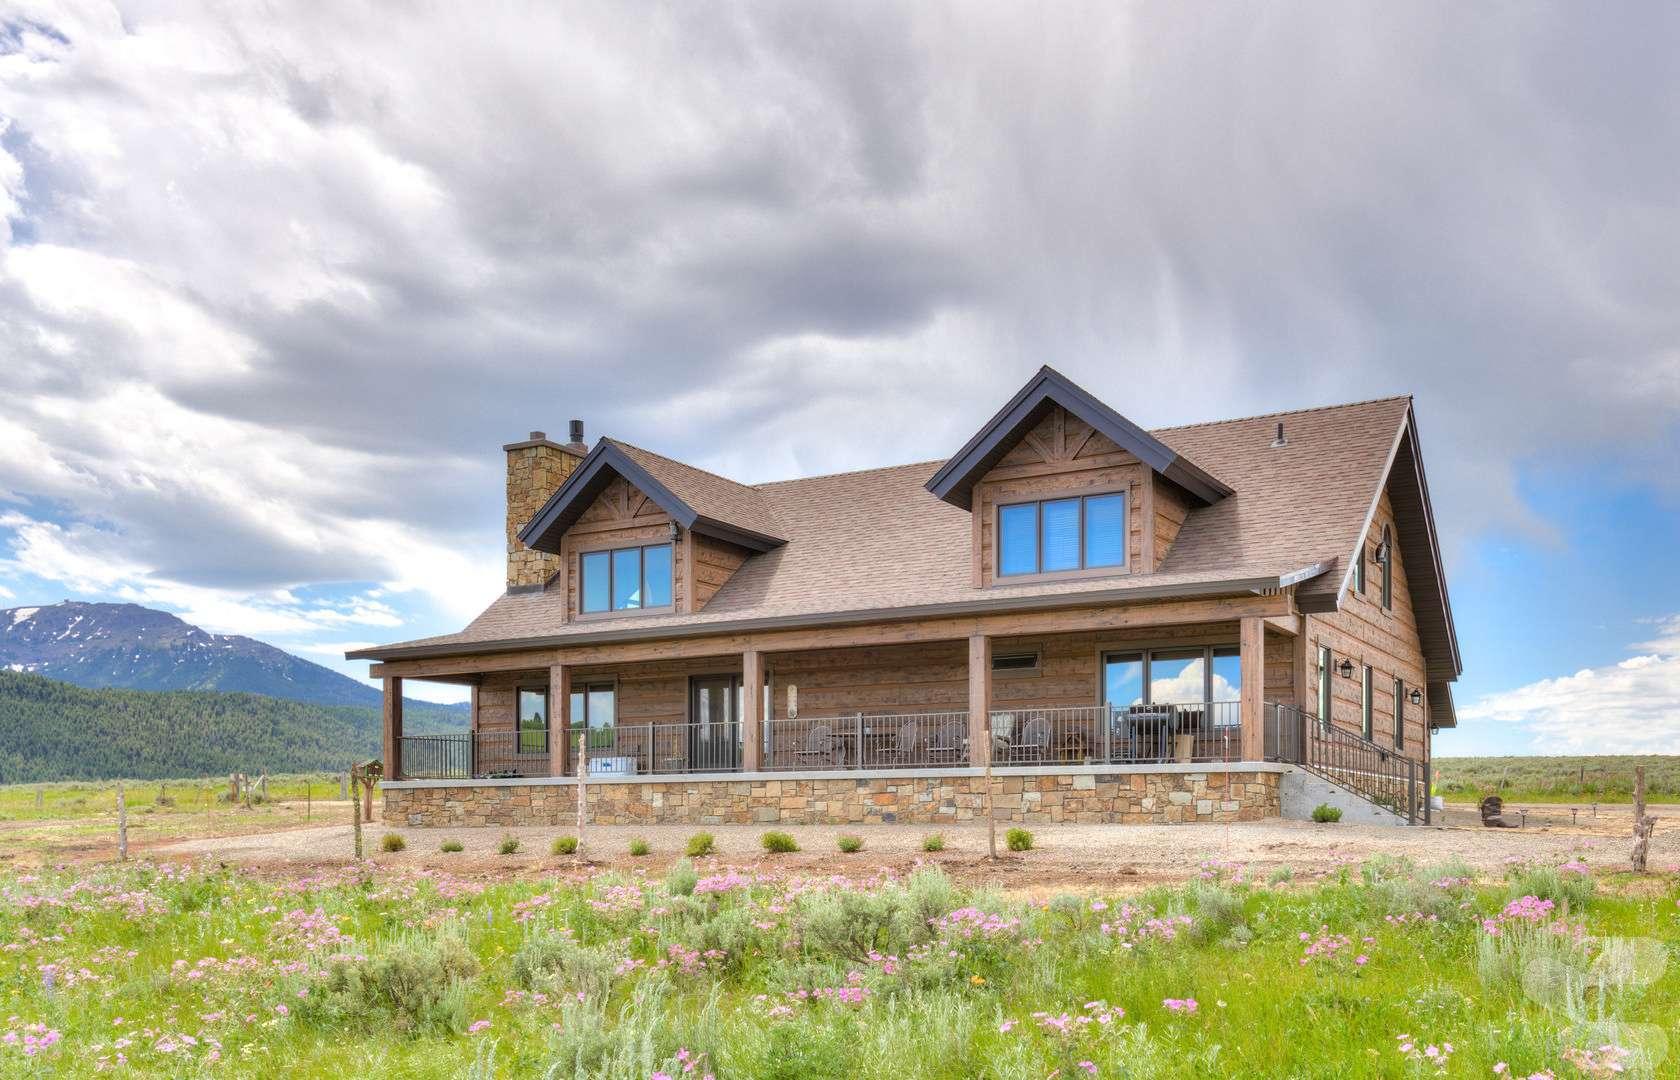 Hand-Hewn Log Siding Home on South Henry's Lake, Idaho